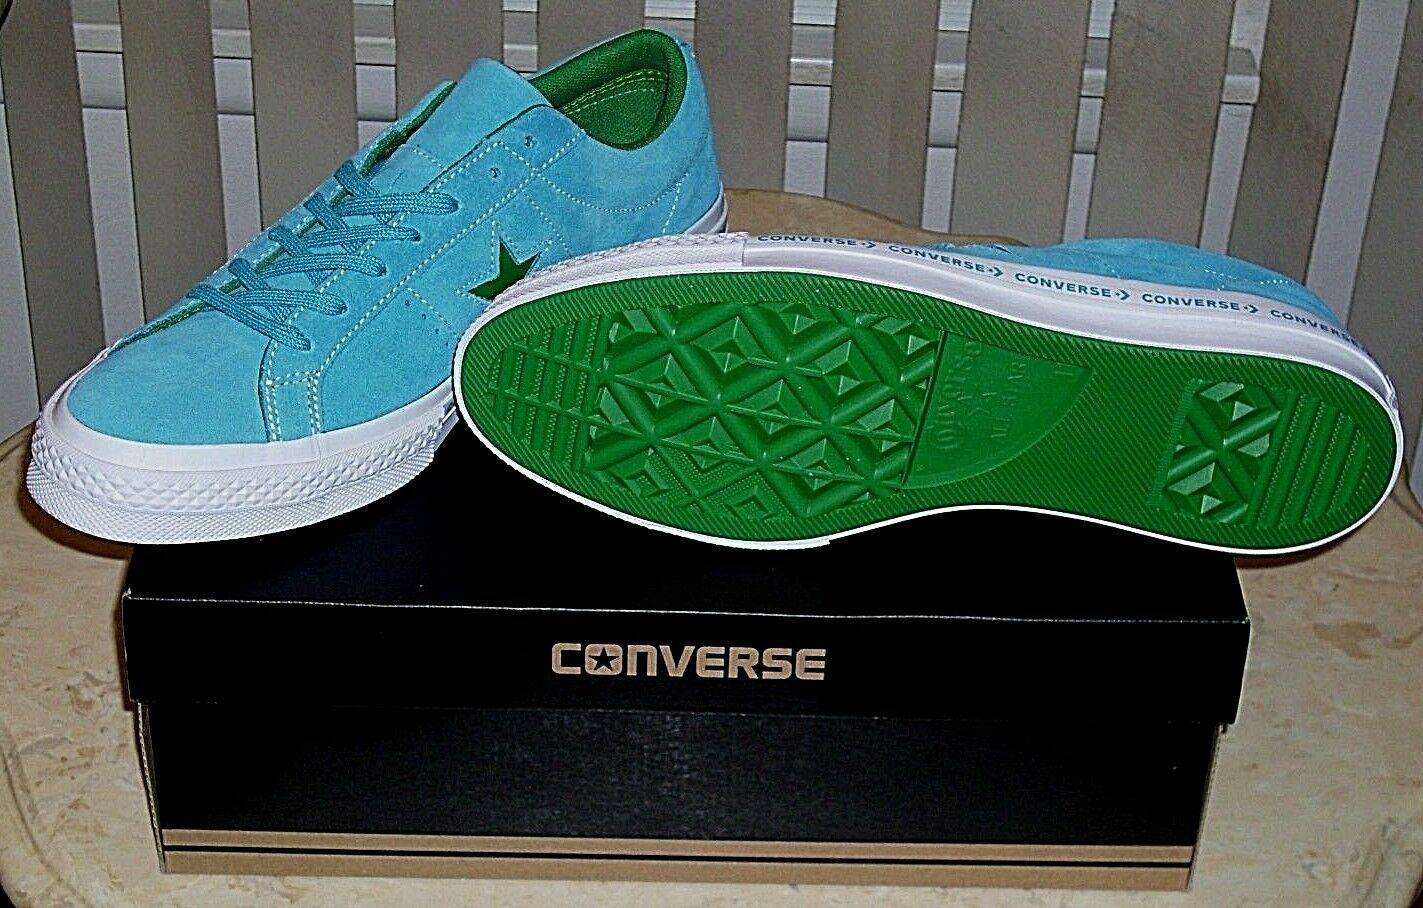 Converse Chuck Taylor All Star Hawaiian Print Ox Shoes Post